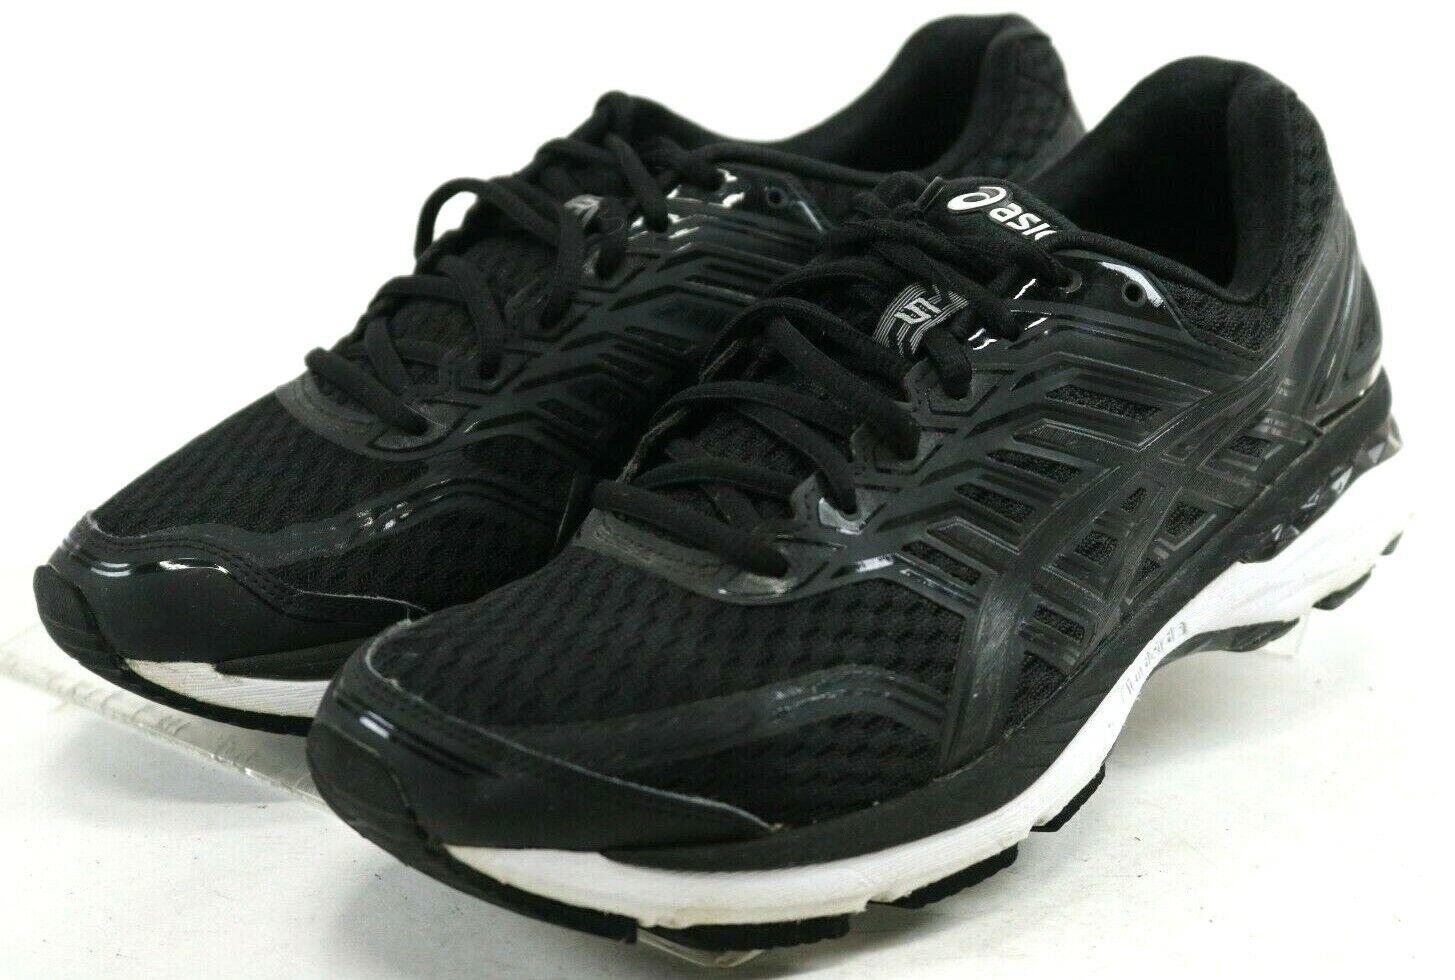 Asics GT-2000 5  120 Men's Running shoes Size 9 Black